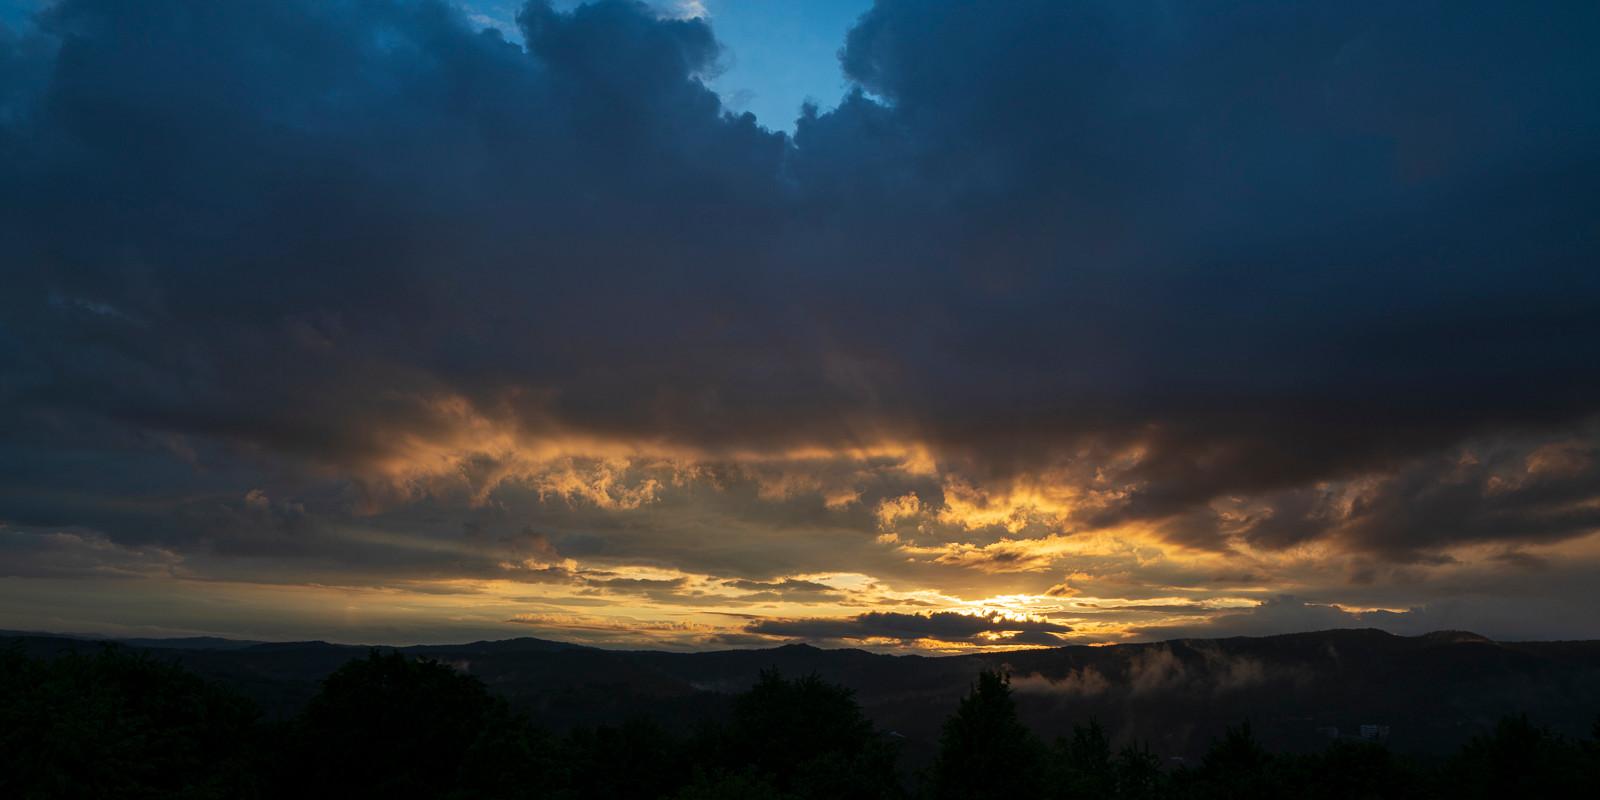 Sunset 27.05.2020